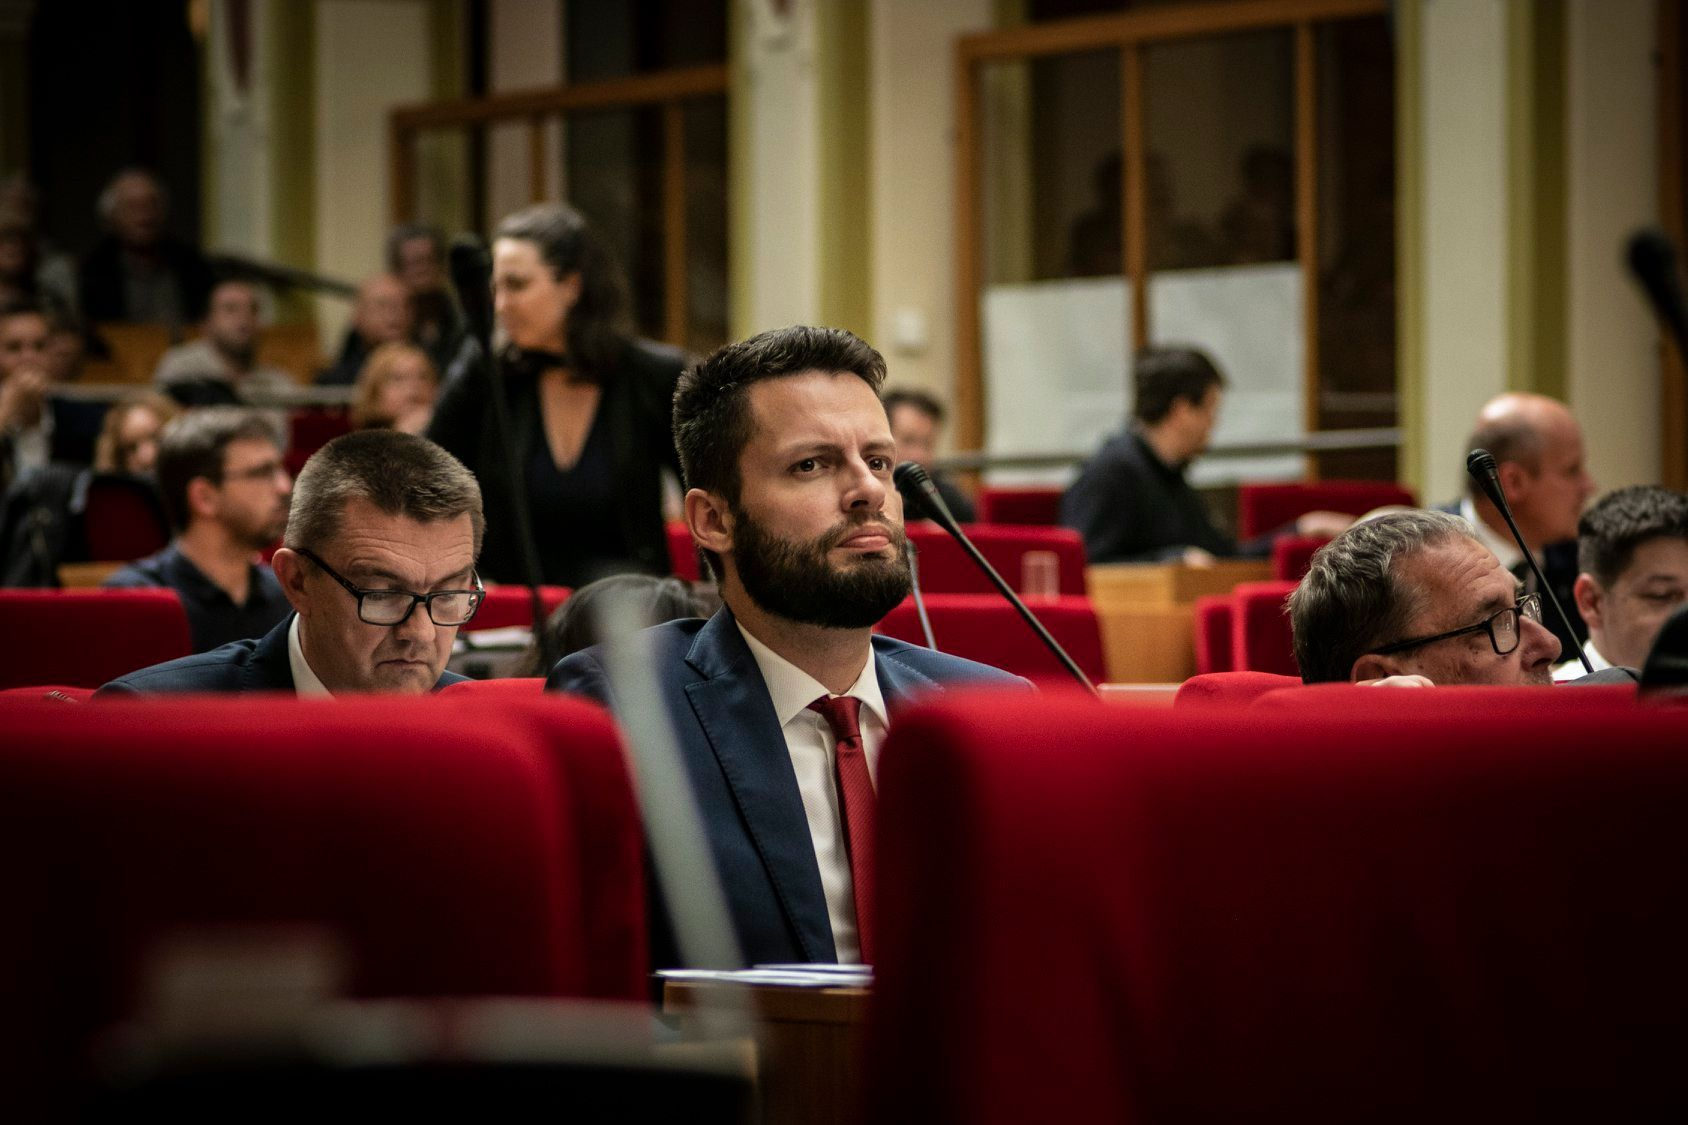 Pomoc podnikatelům v Praze – MHMP versus MPO?